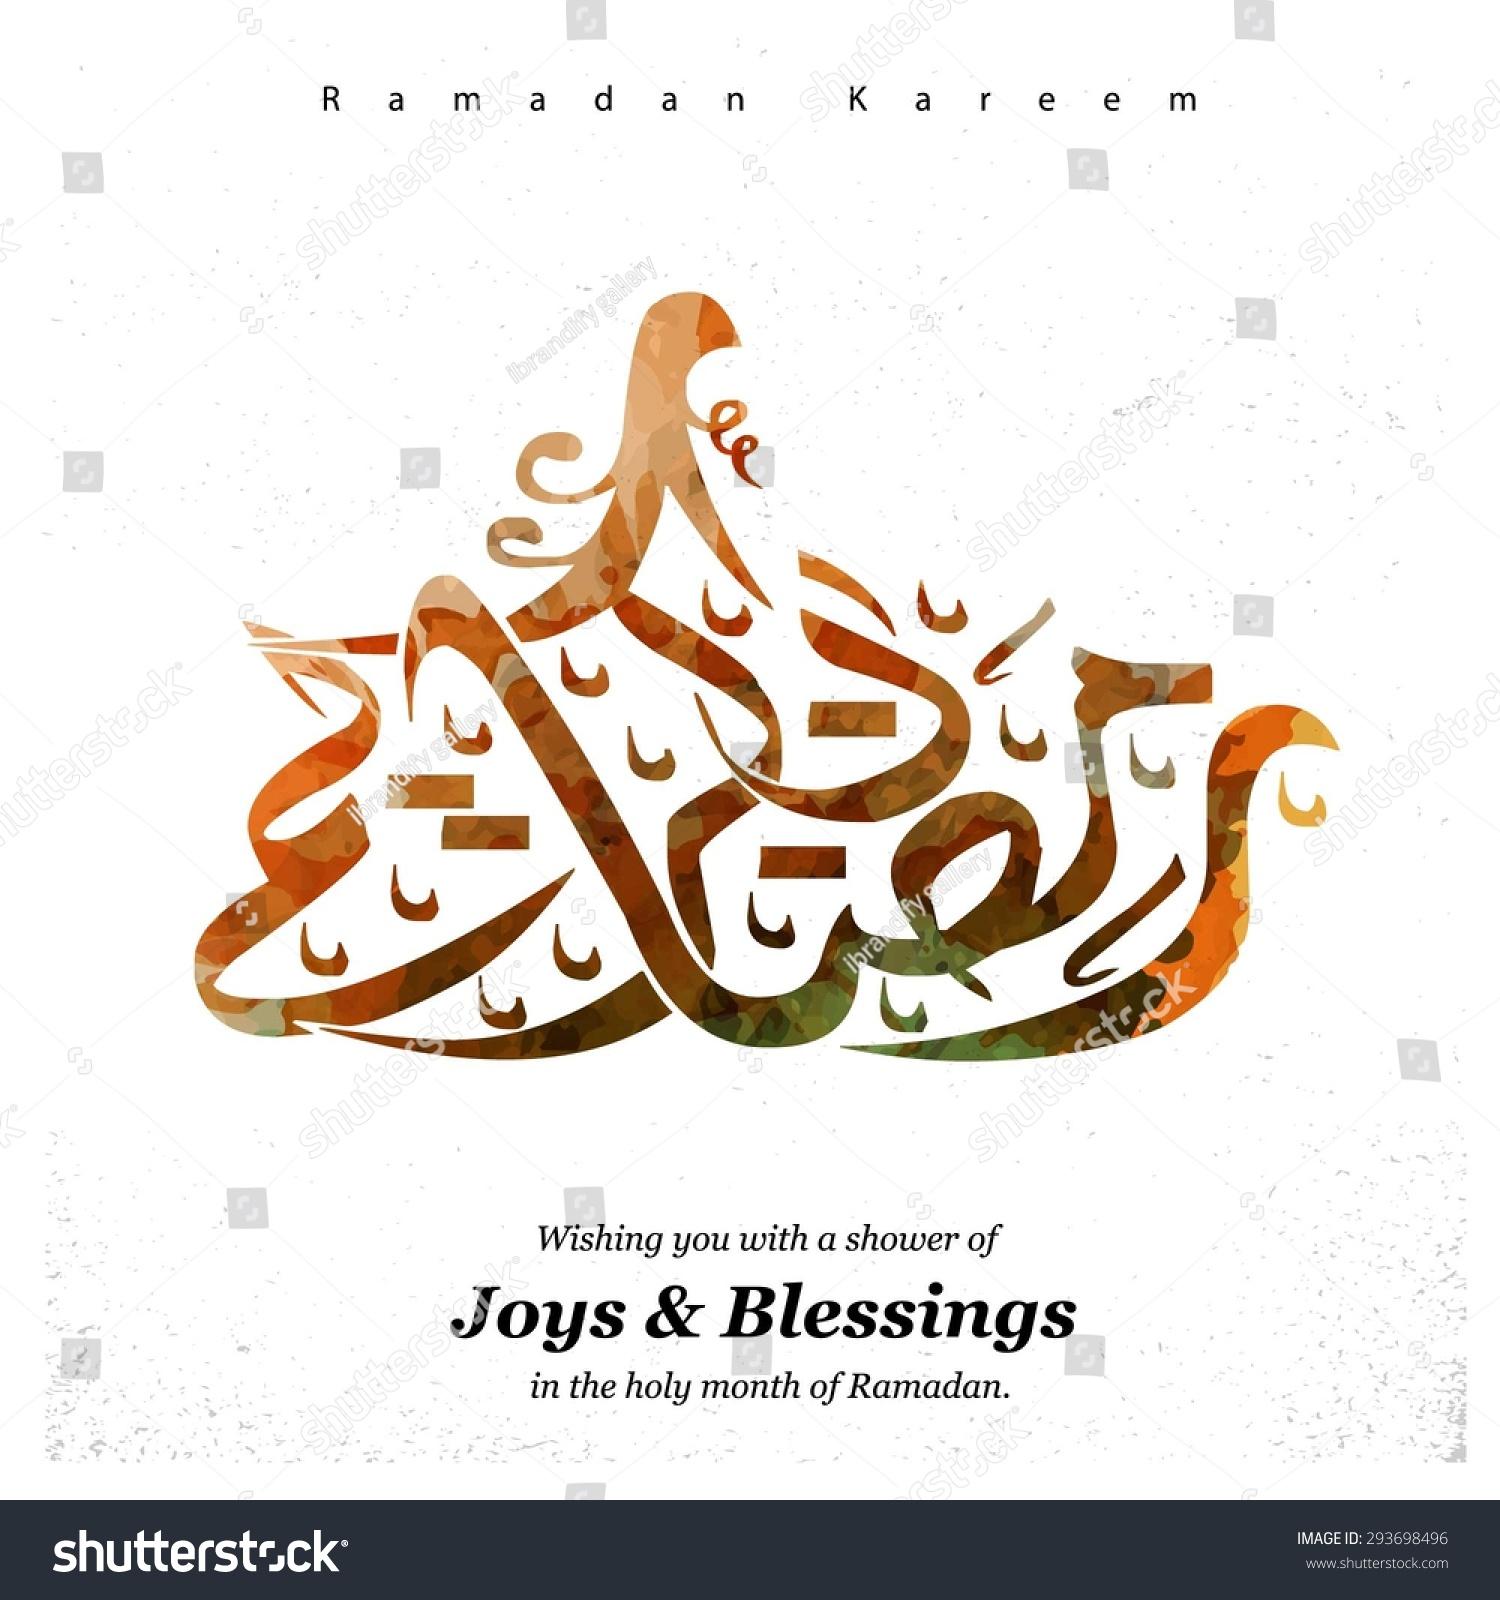 Colorful Arabic Greeting Word Ramadan Kareem Calligraphy